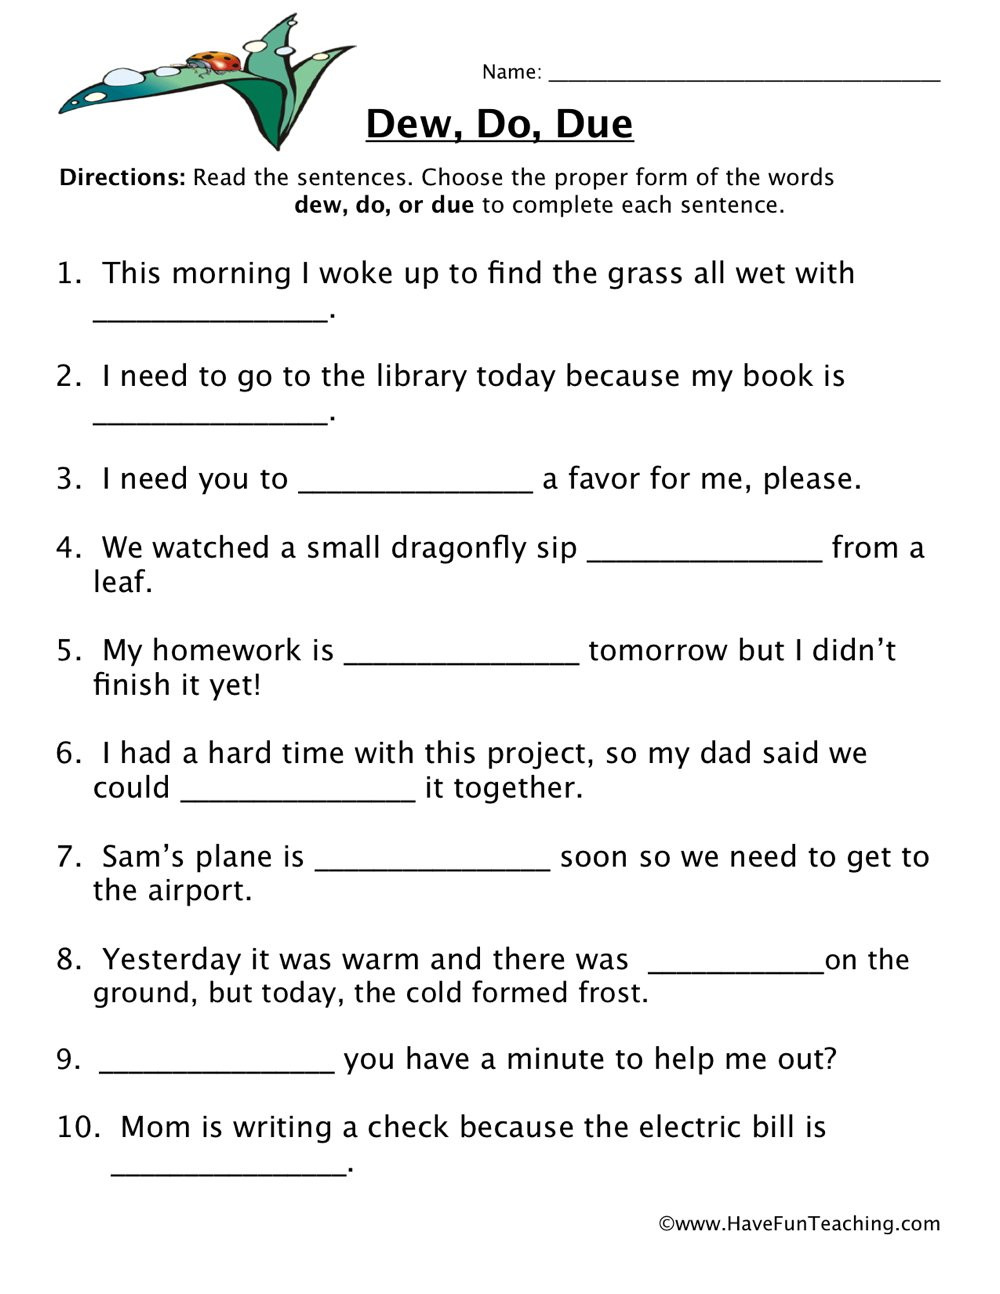 Homophones Worksheets for Grade 5 Dew Do Due Homophones Worksheet